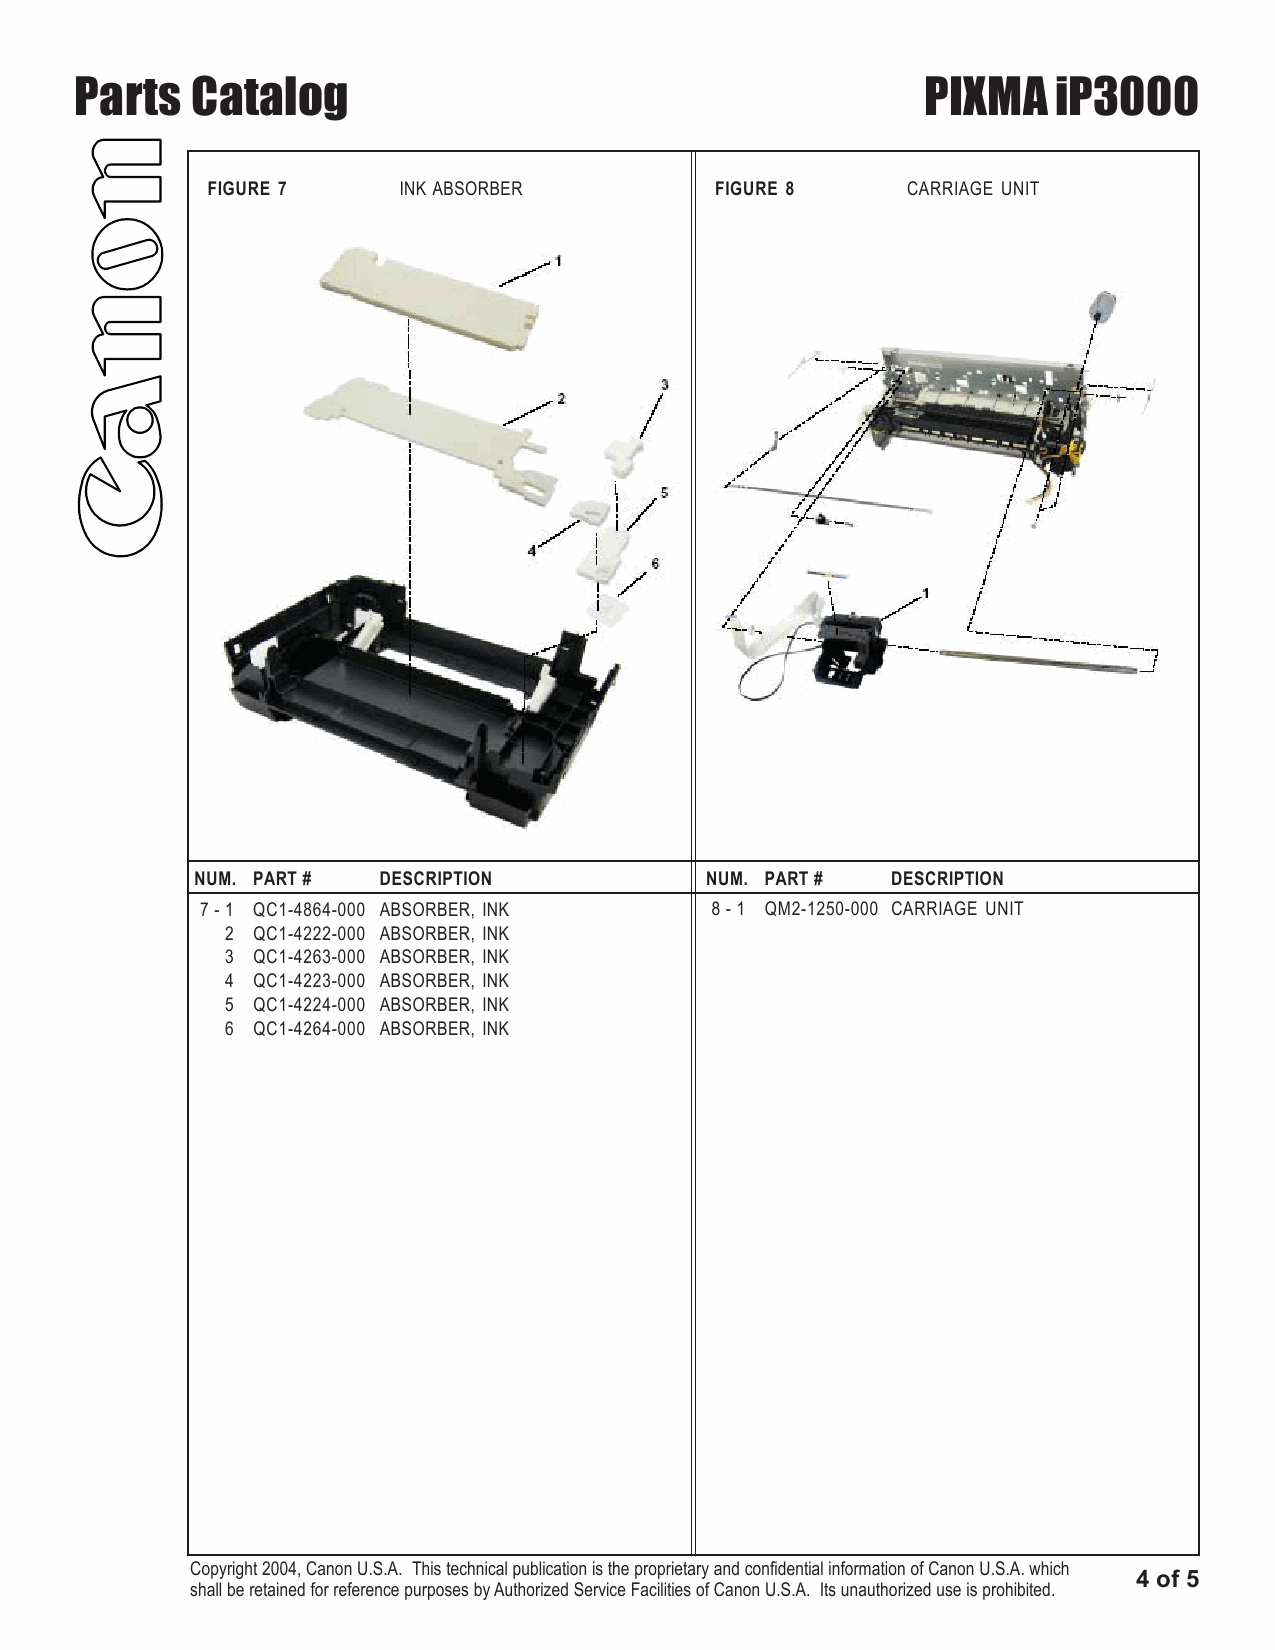 canon pixma ip3000 ip 3000 service manual parts catalog rh digitalrepairmanuals info Canon PIXMA iP4000 Canon PIXMA iP1800